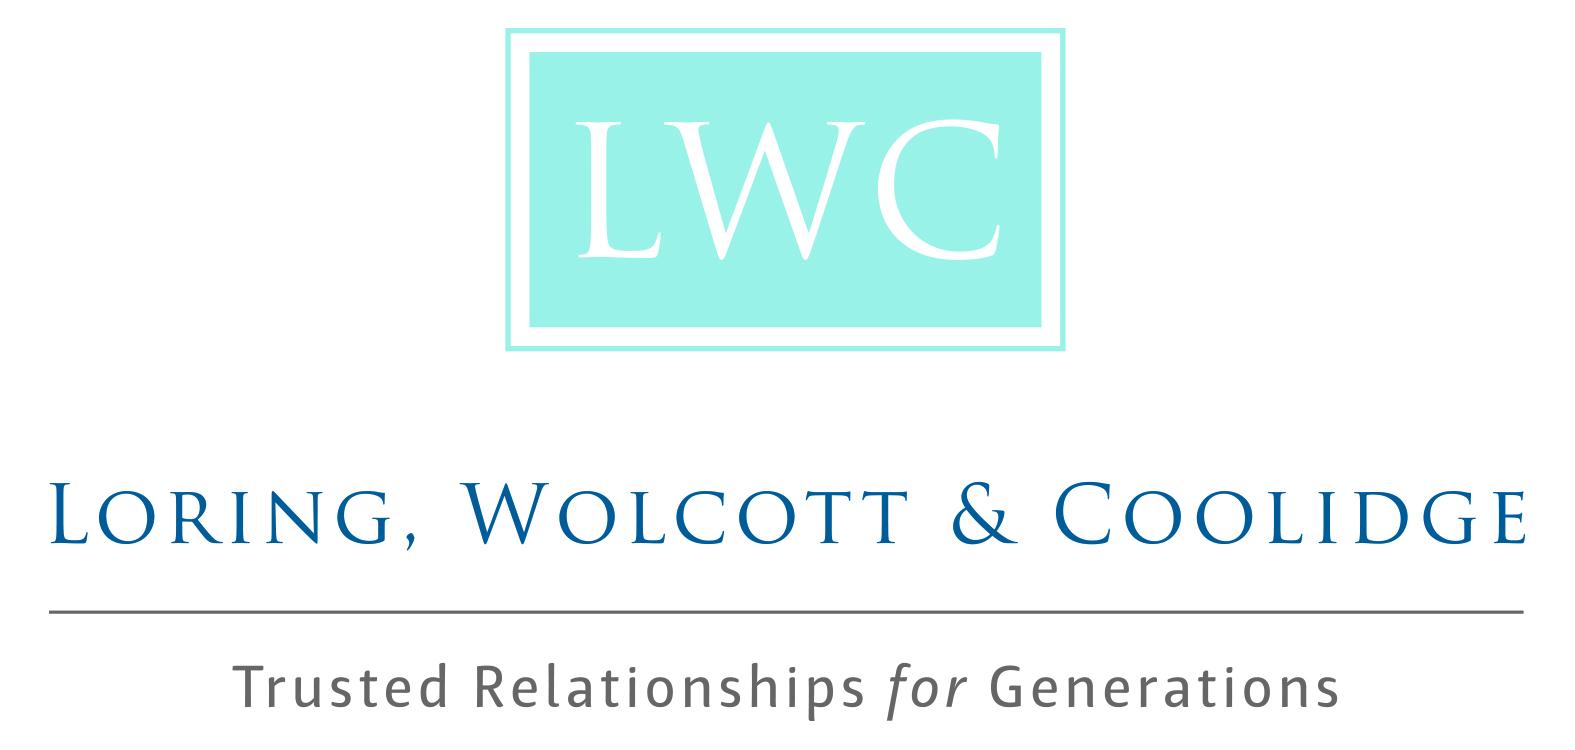 Loring Wolcott & Coolidge